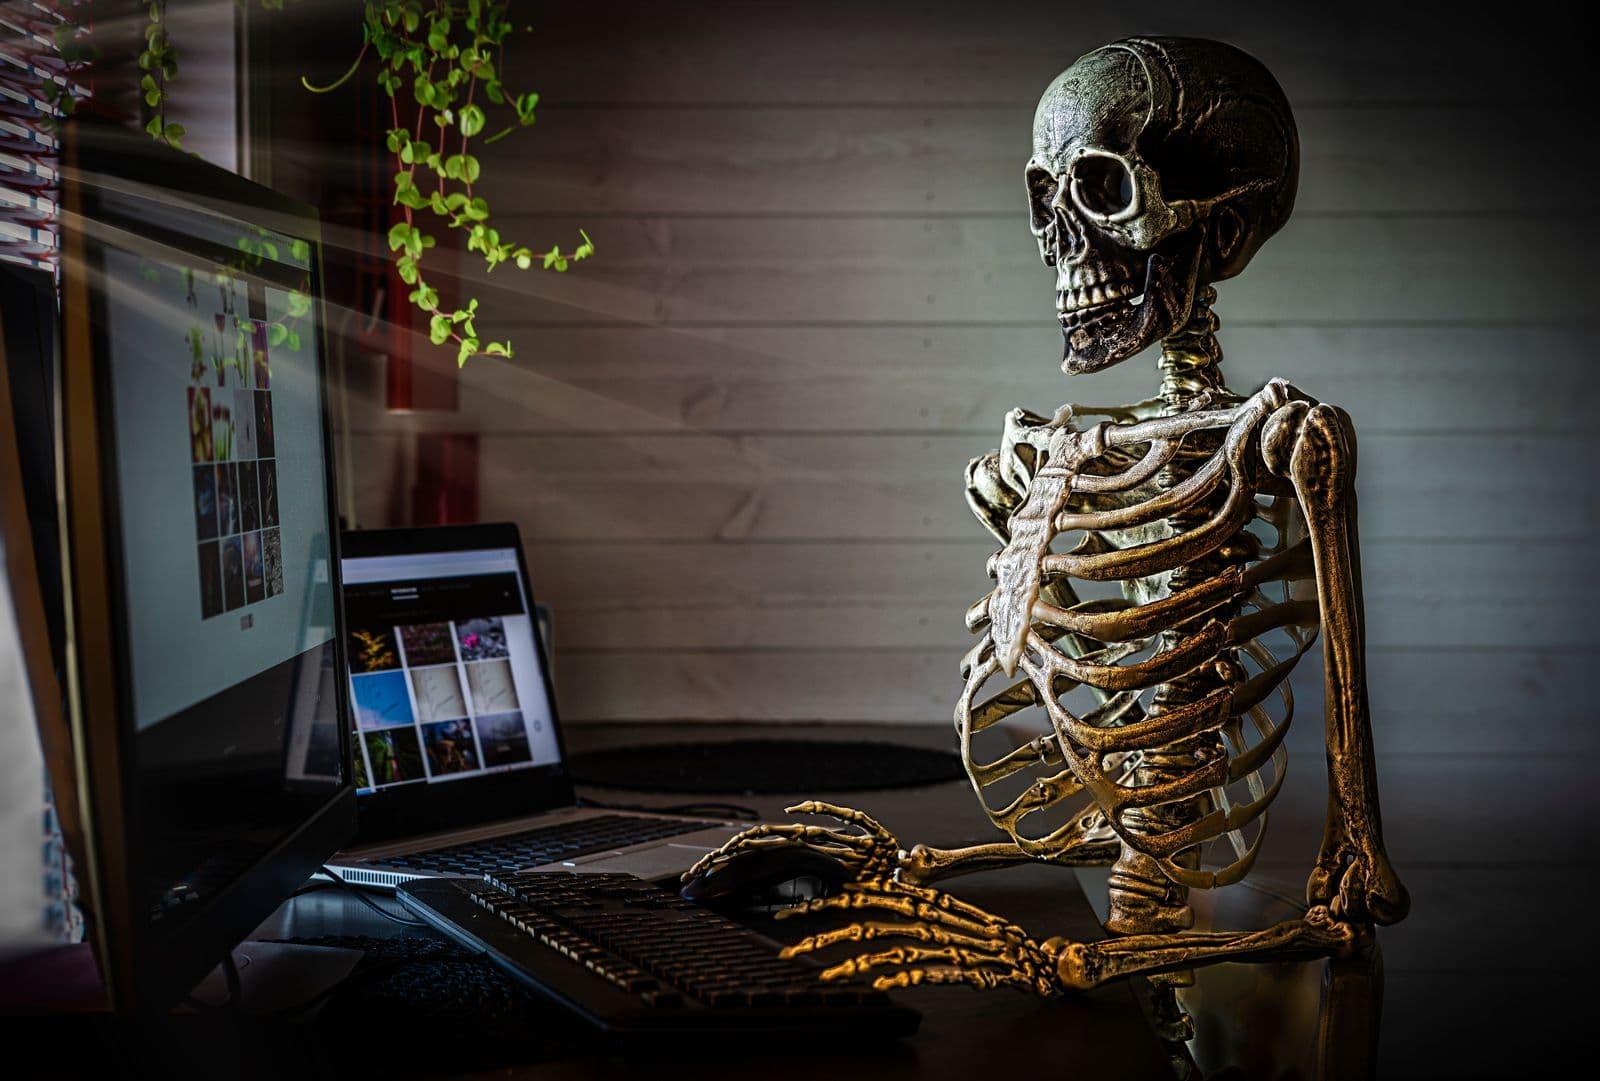 prop skeleton in an office